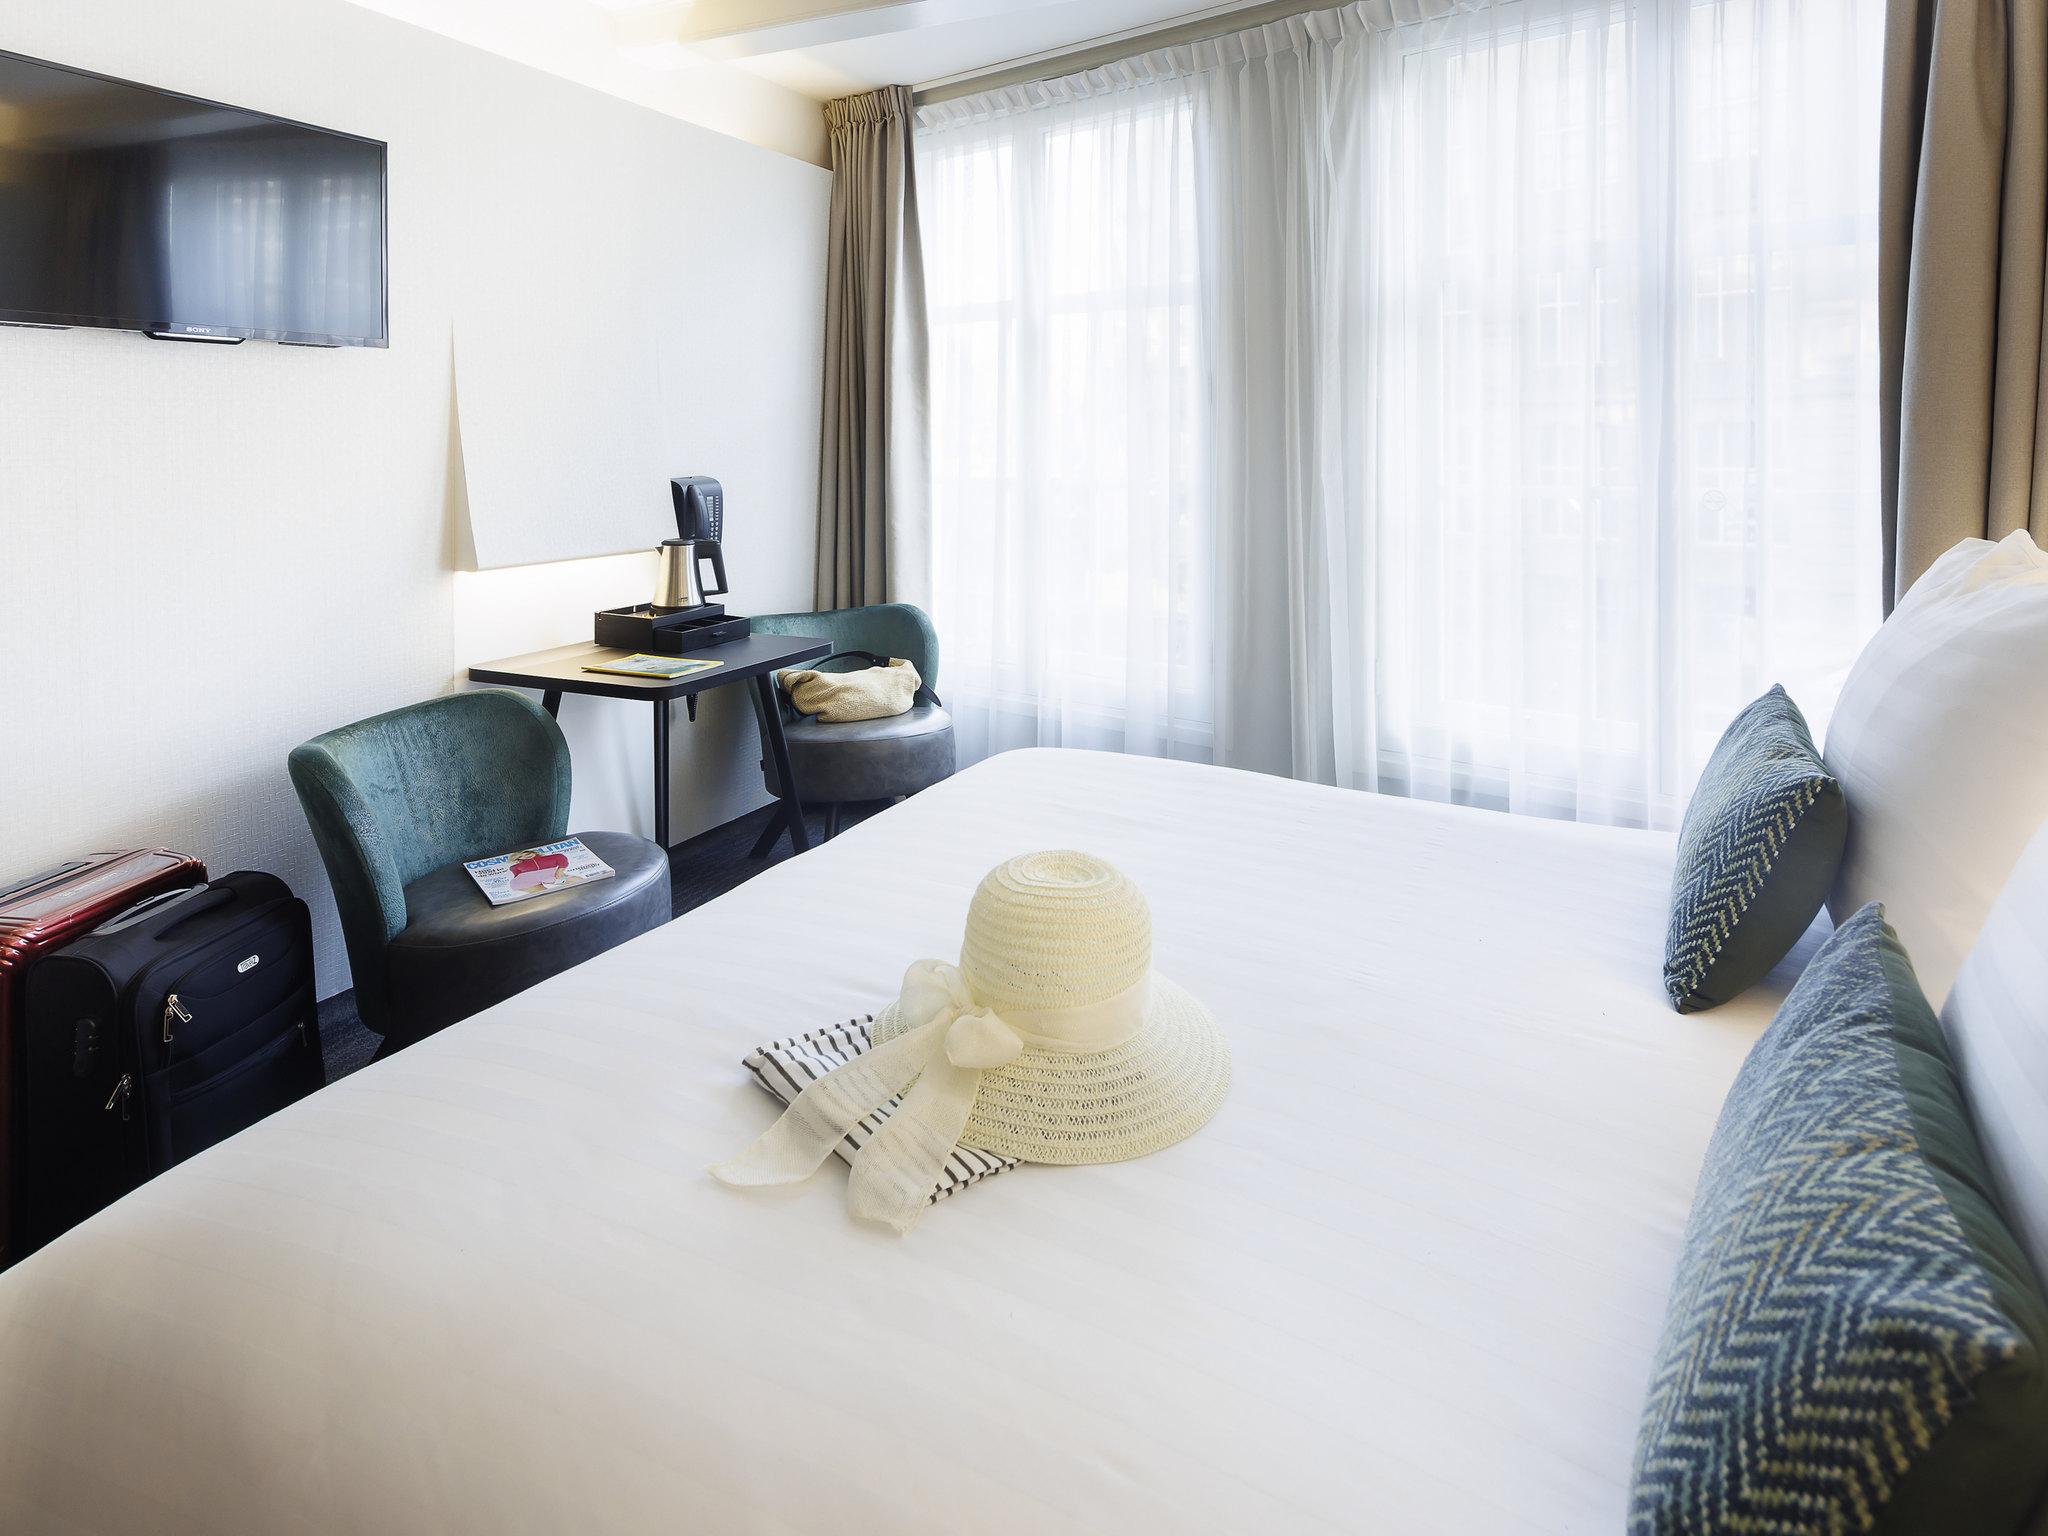 فندق - إيبيس ستايلز ibis Styles أمستردام سنترال ستايشن